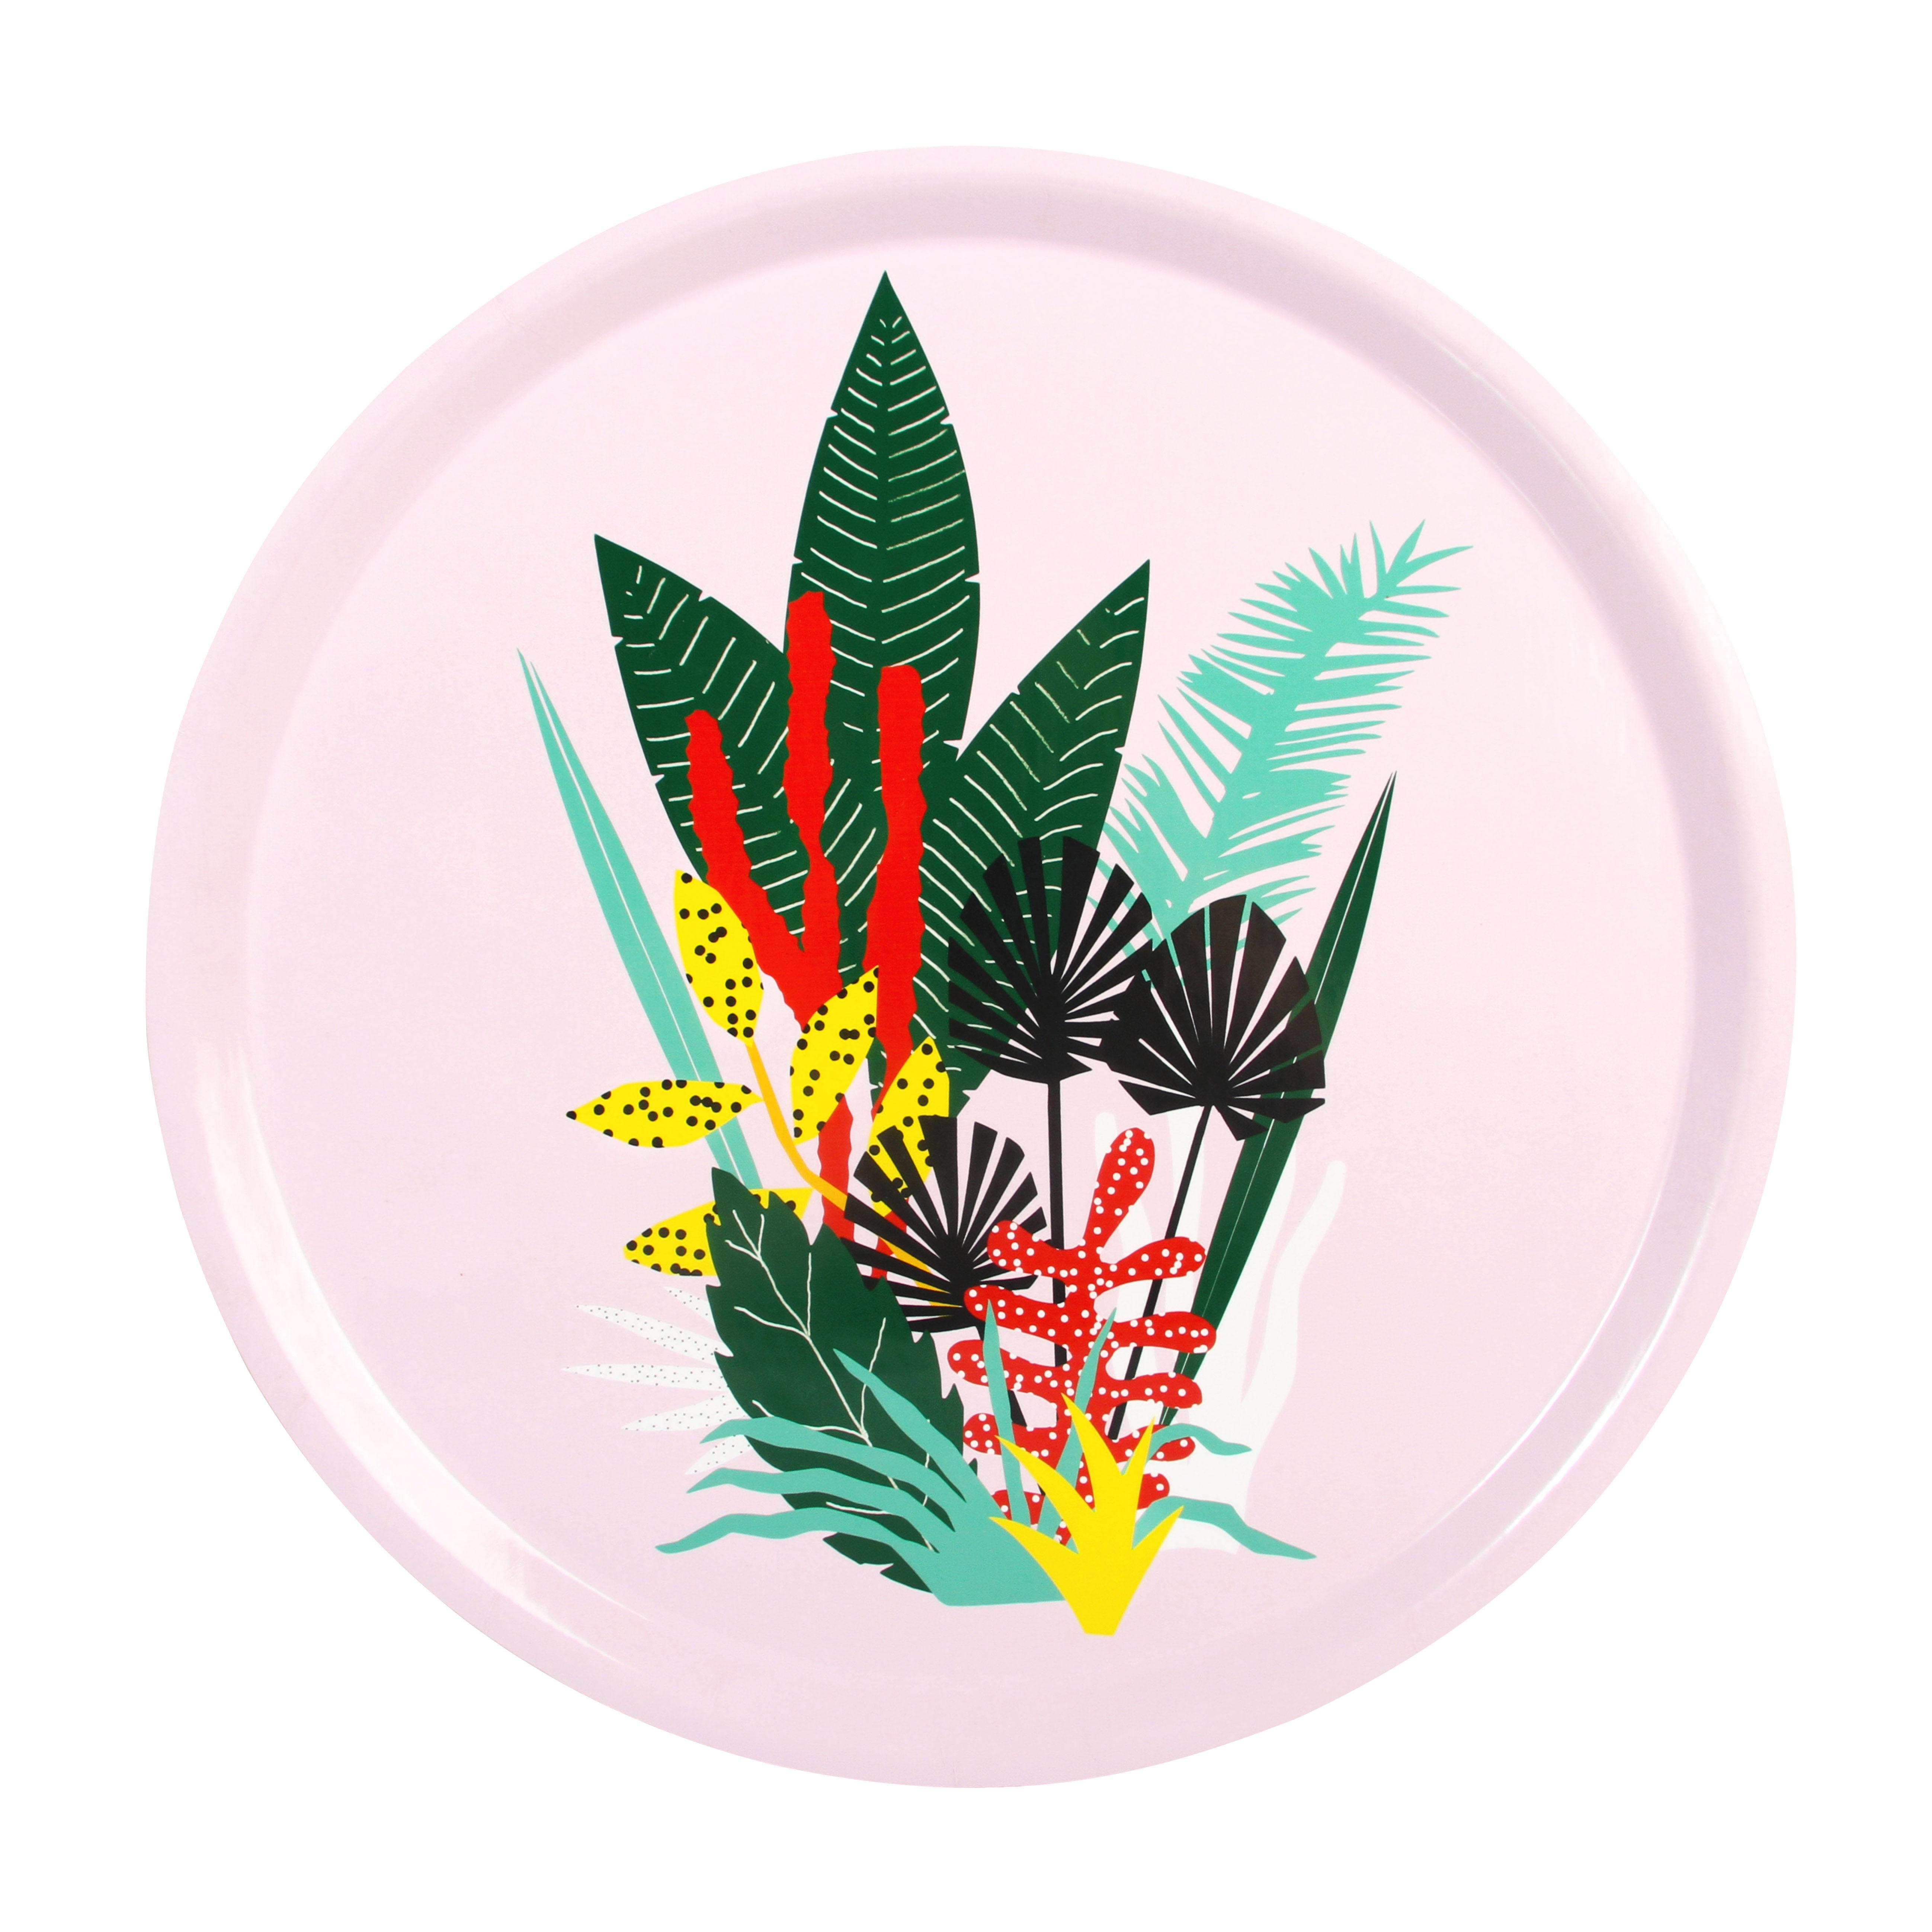 Tavola - Vassoi  - Vassoio Botanic / Melamina - Ø 35 cm - & klevering - Fiori multicolori / Fondo rosa - Compensato, Melamina